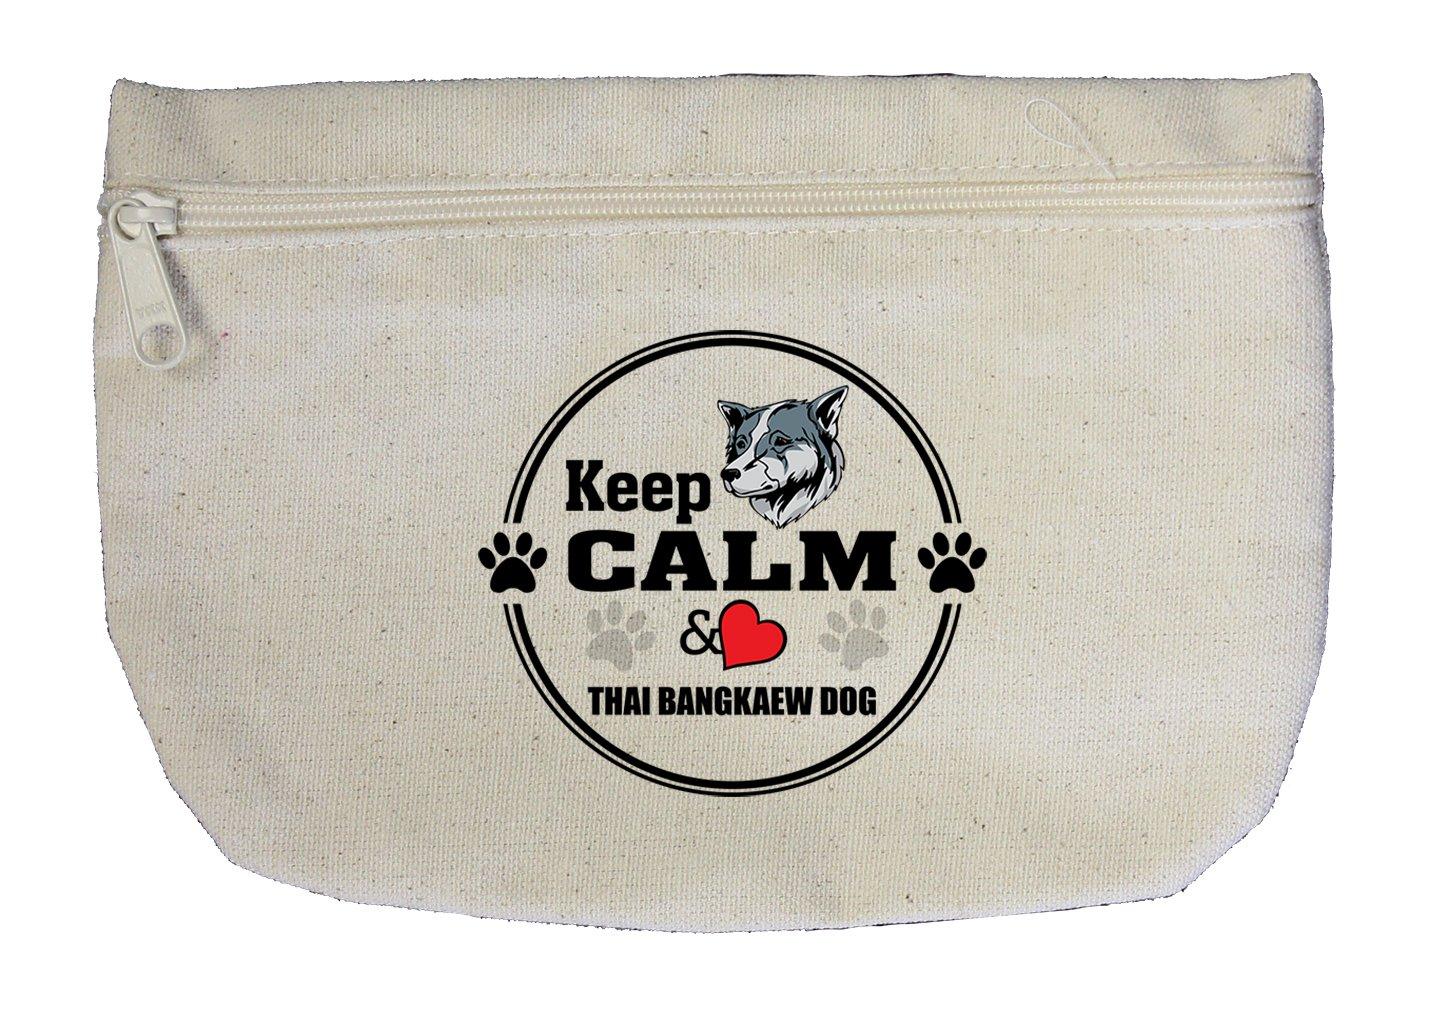 Canvas Zipper Pouch Bag Keep Calm Love Thai Bangkaew Dogdog Style In Print by Style in Print